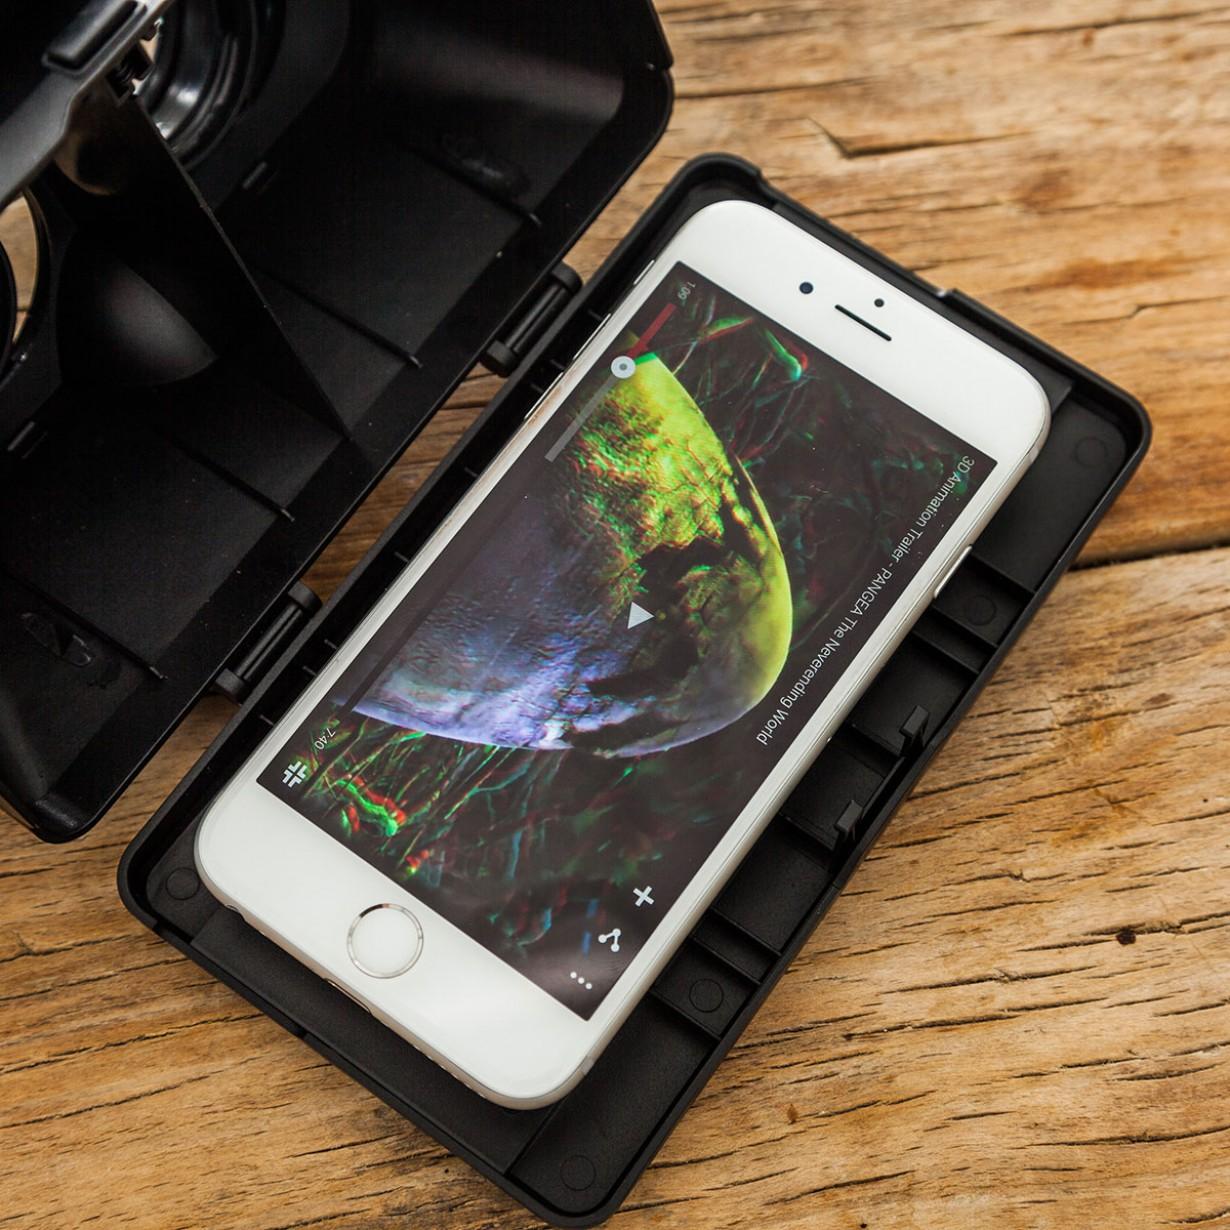 visore realta virtuale per smartphone iphone